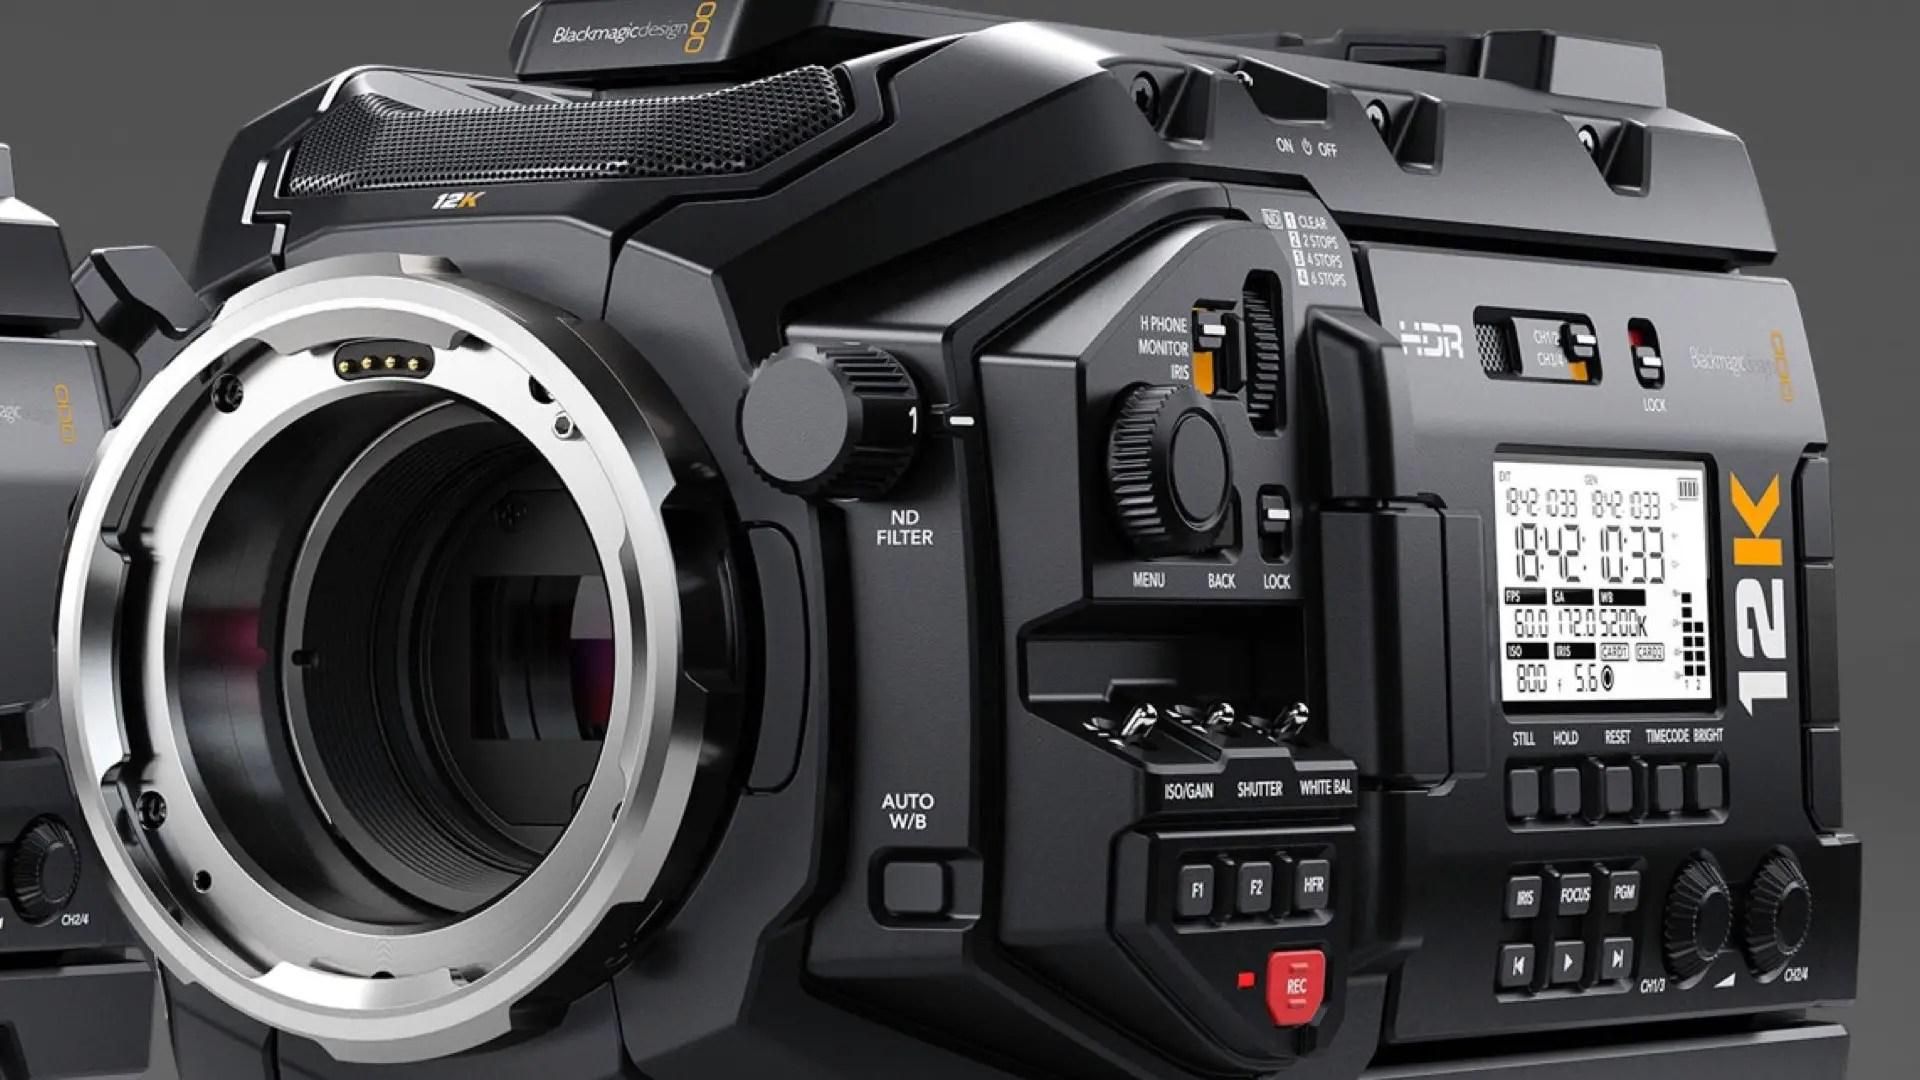 Blackmagic Ursa Mini Pro 12k Test Footage Of Mixed Resolutions Y M Cinema News Insights On Digital Cinema